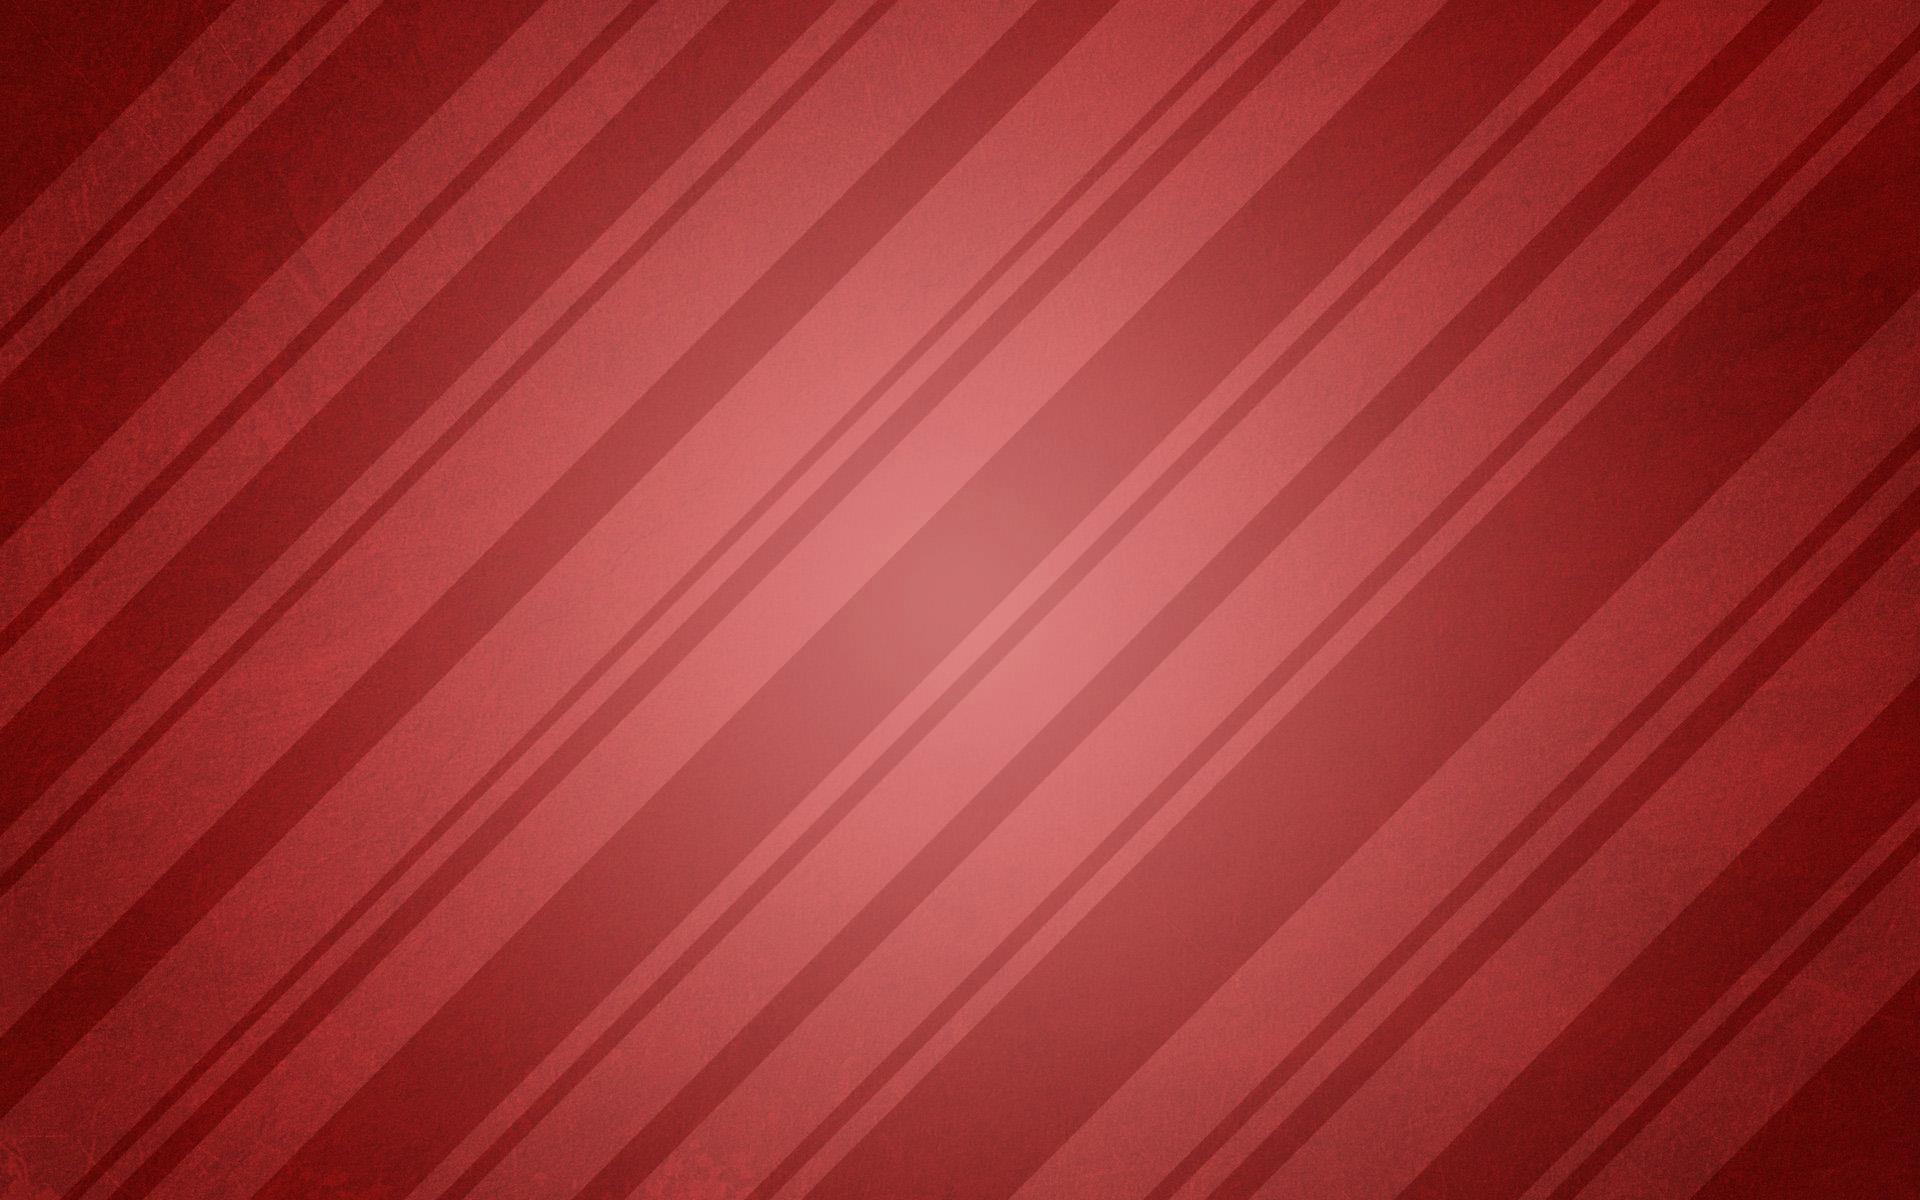 Simple Lines Wallpaper  Wallpaper Wide Hd